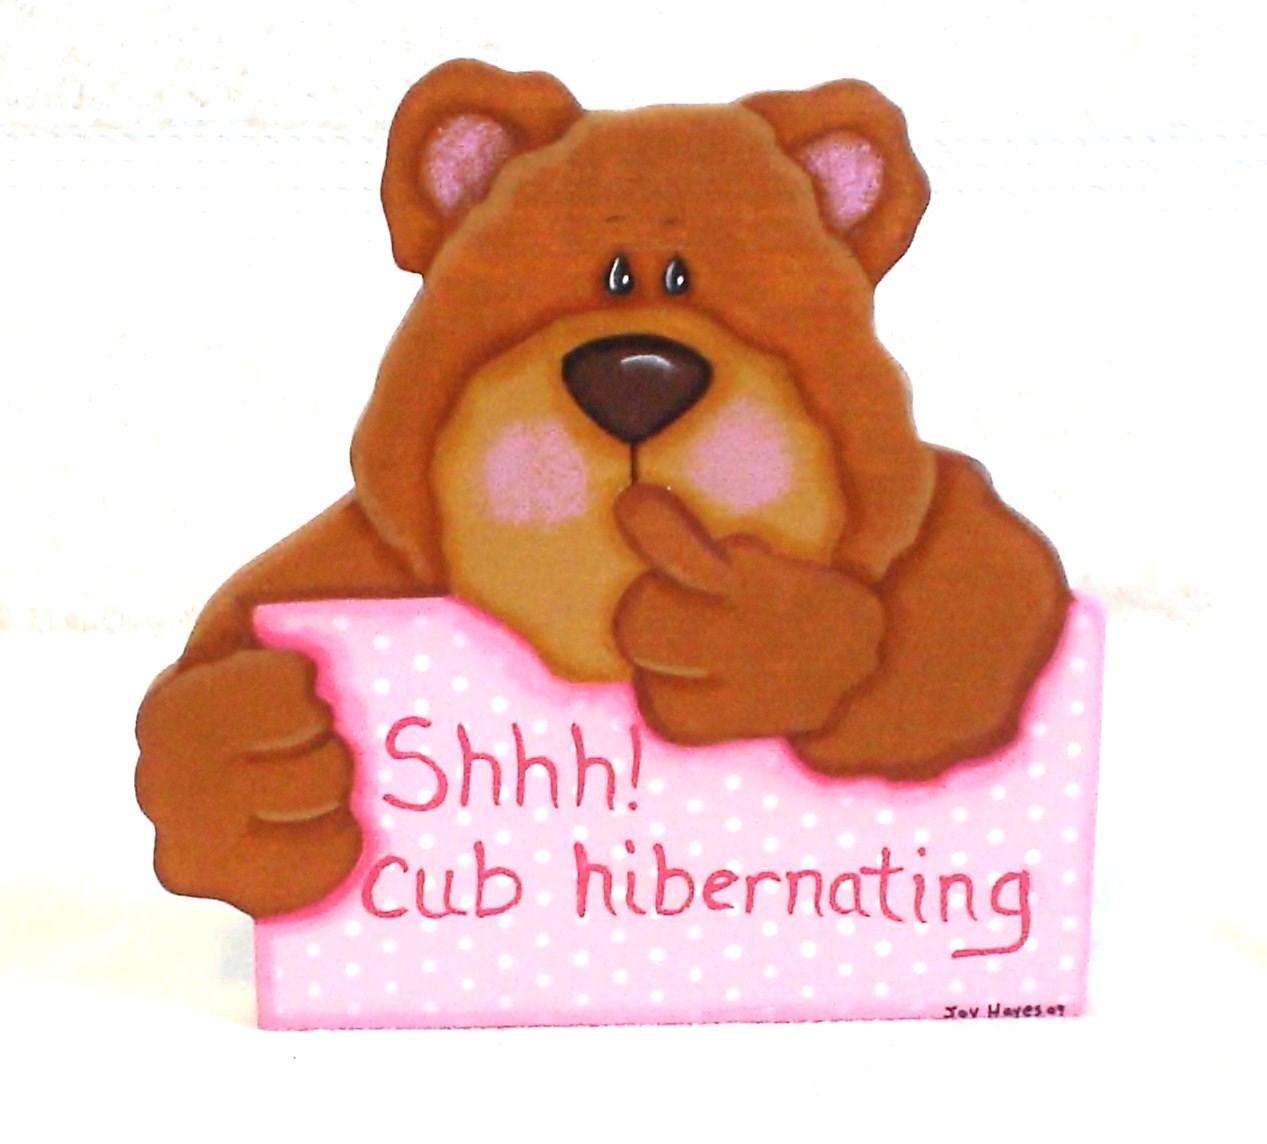 Free Bear Preschool Cliparts, Download Free Clip Art, Free ... (1267 x 1144 Pixel)